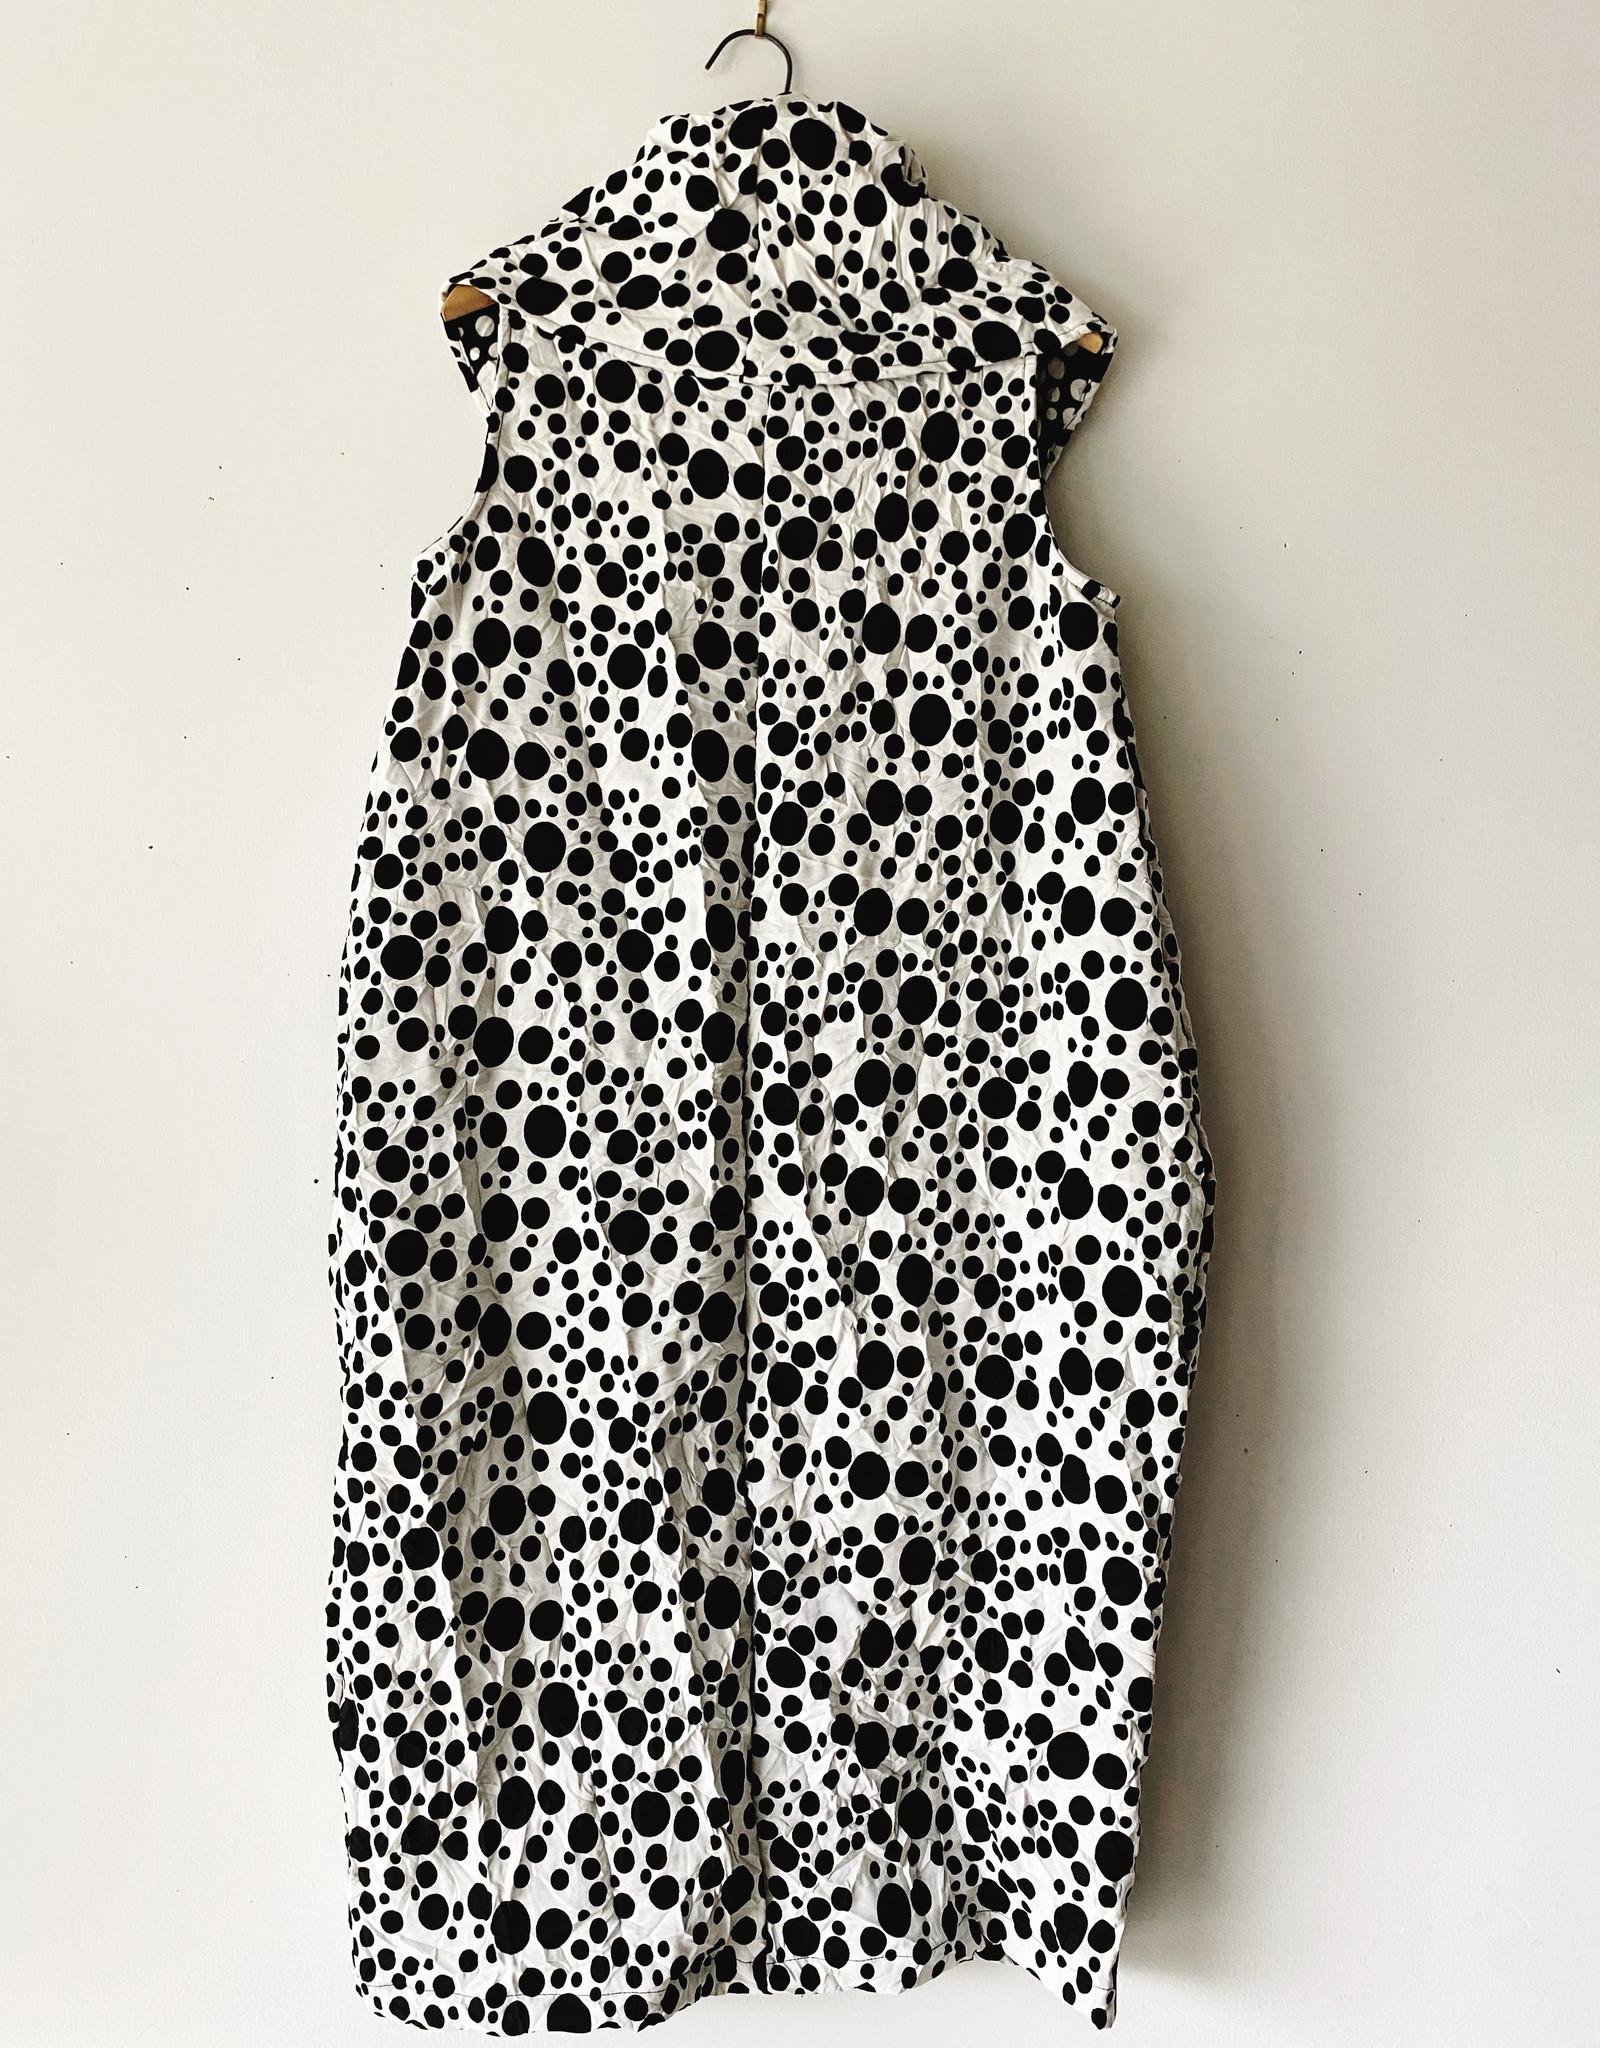 CHALET T26441 CHALET YVONNE DRESS